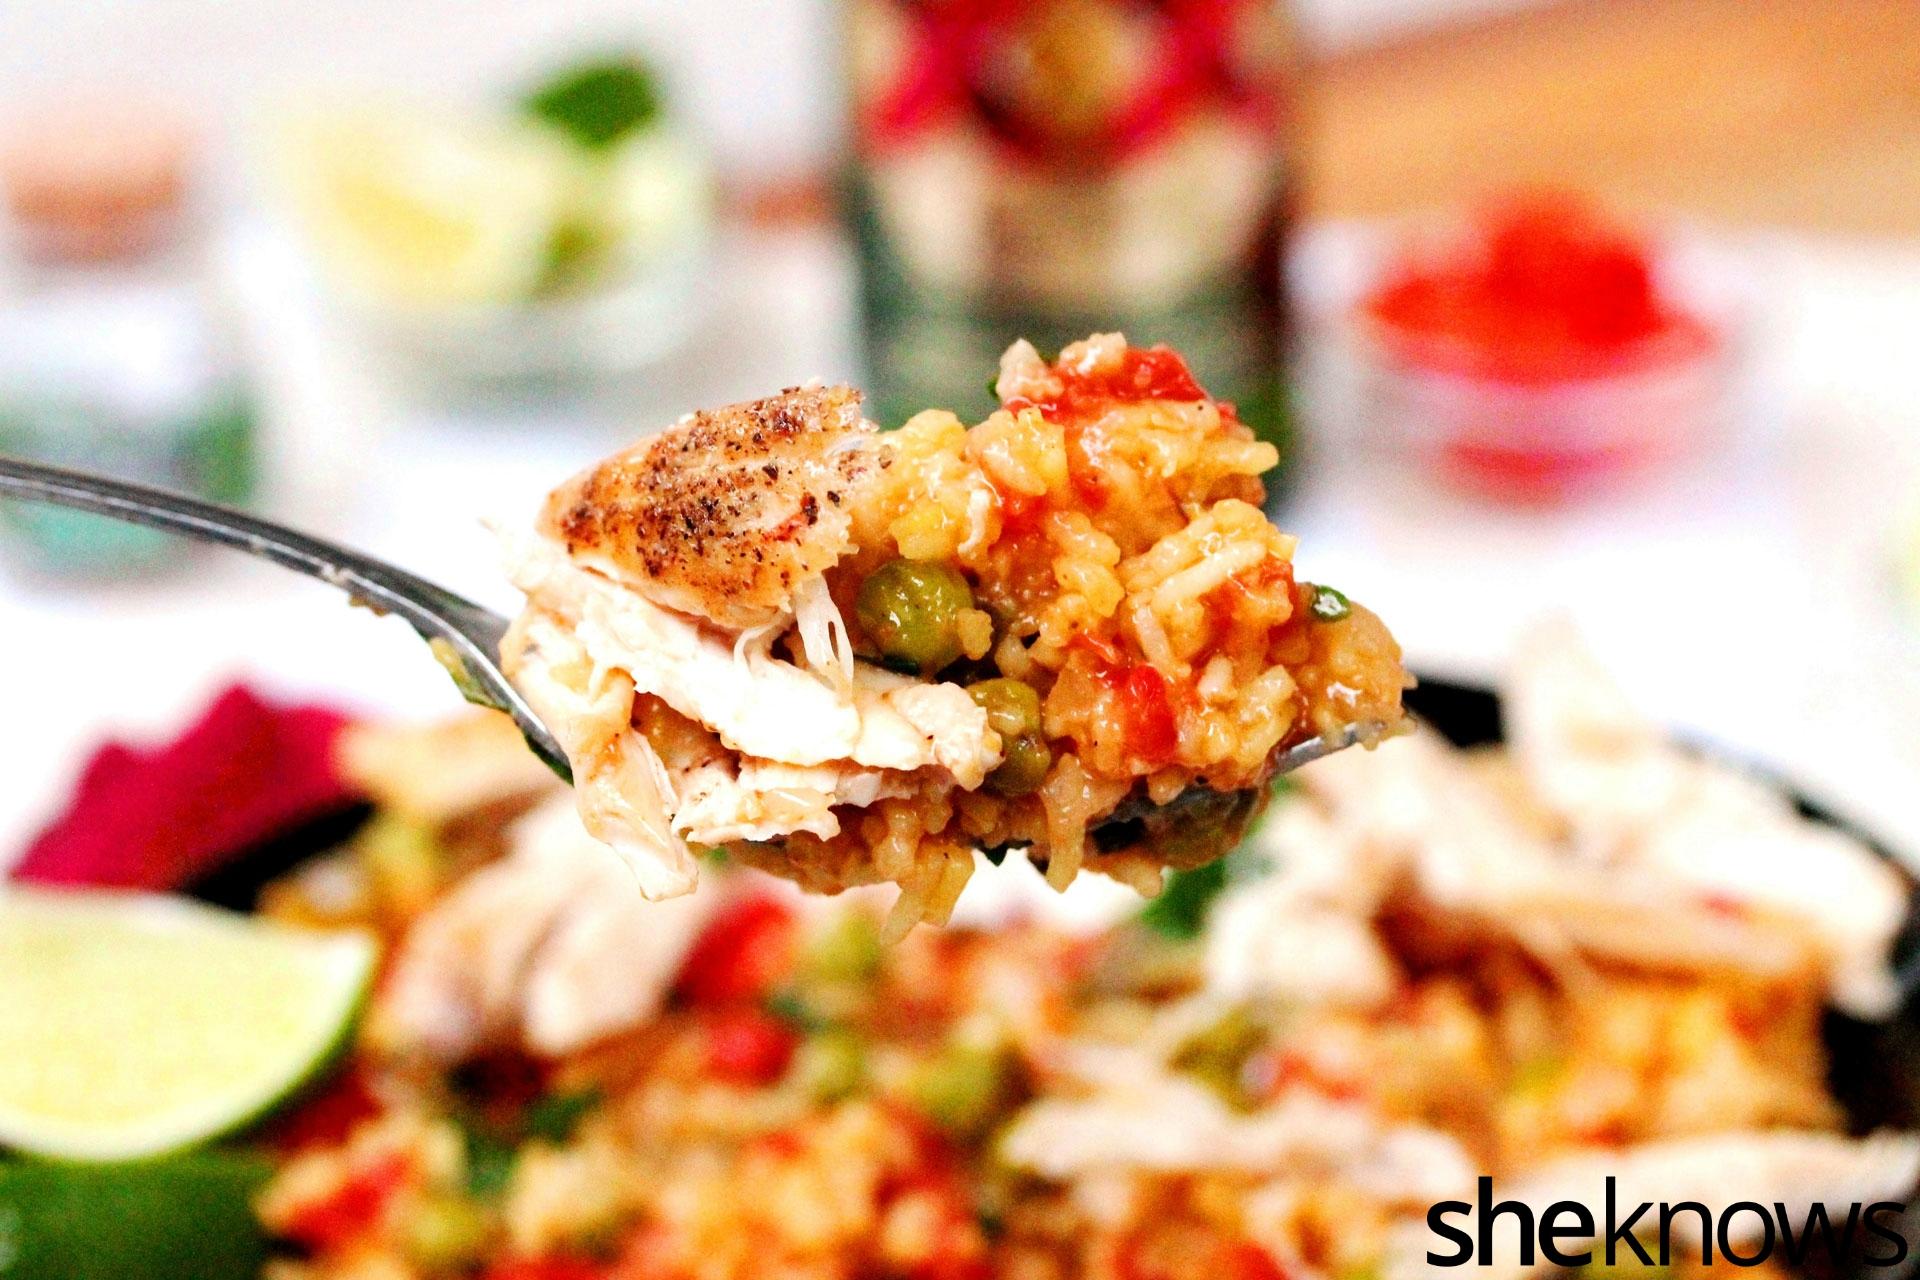 bite-of-chicken-and-rice